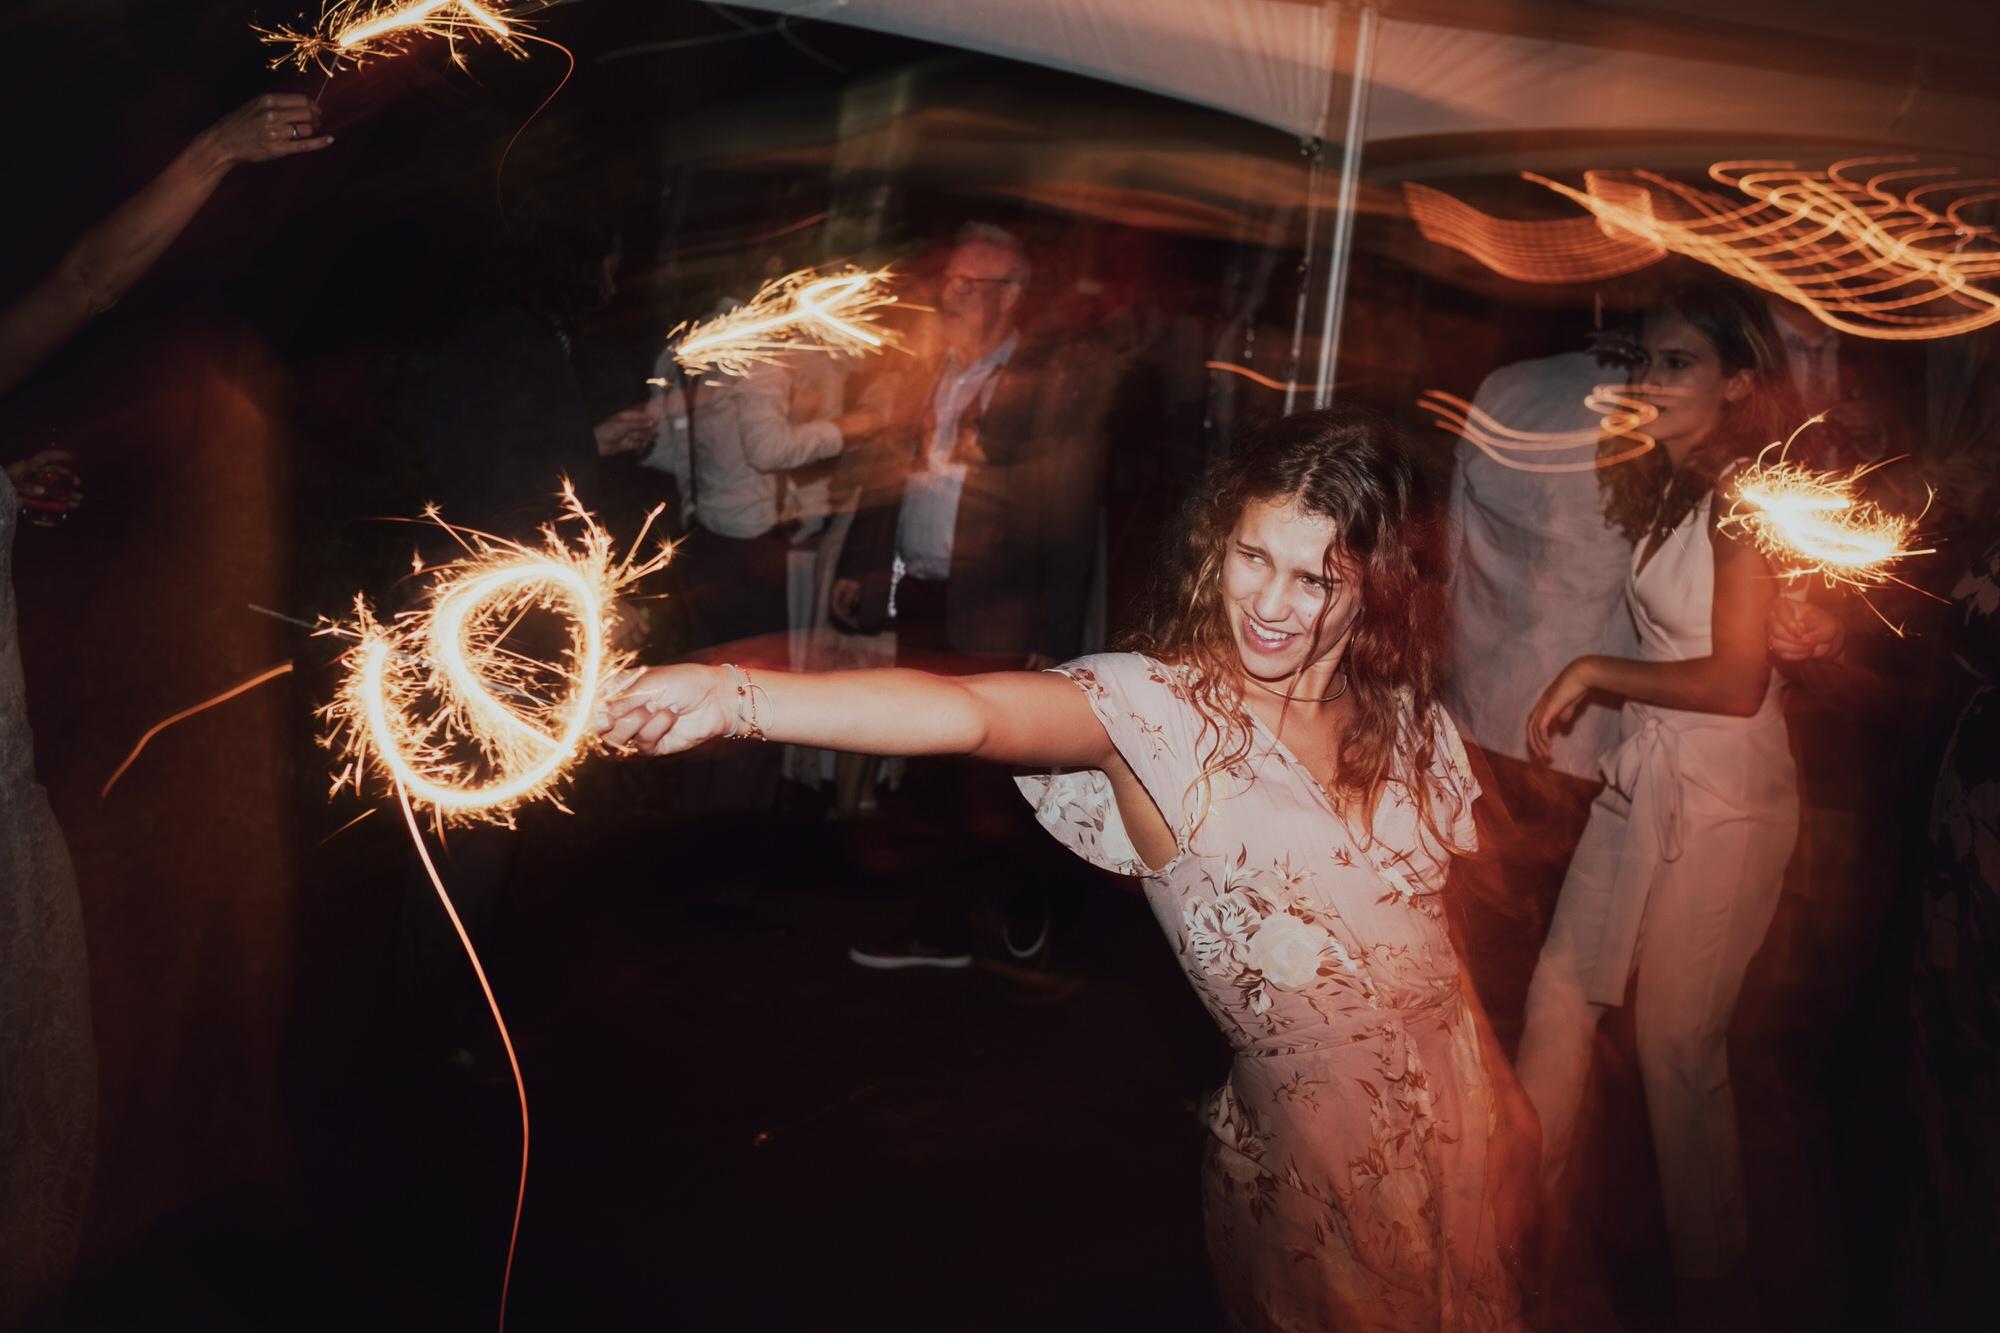 emily-aaron-rochester-new-york-wedding-photographer-163.JPG